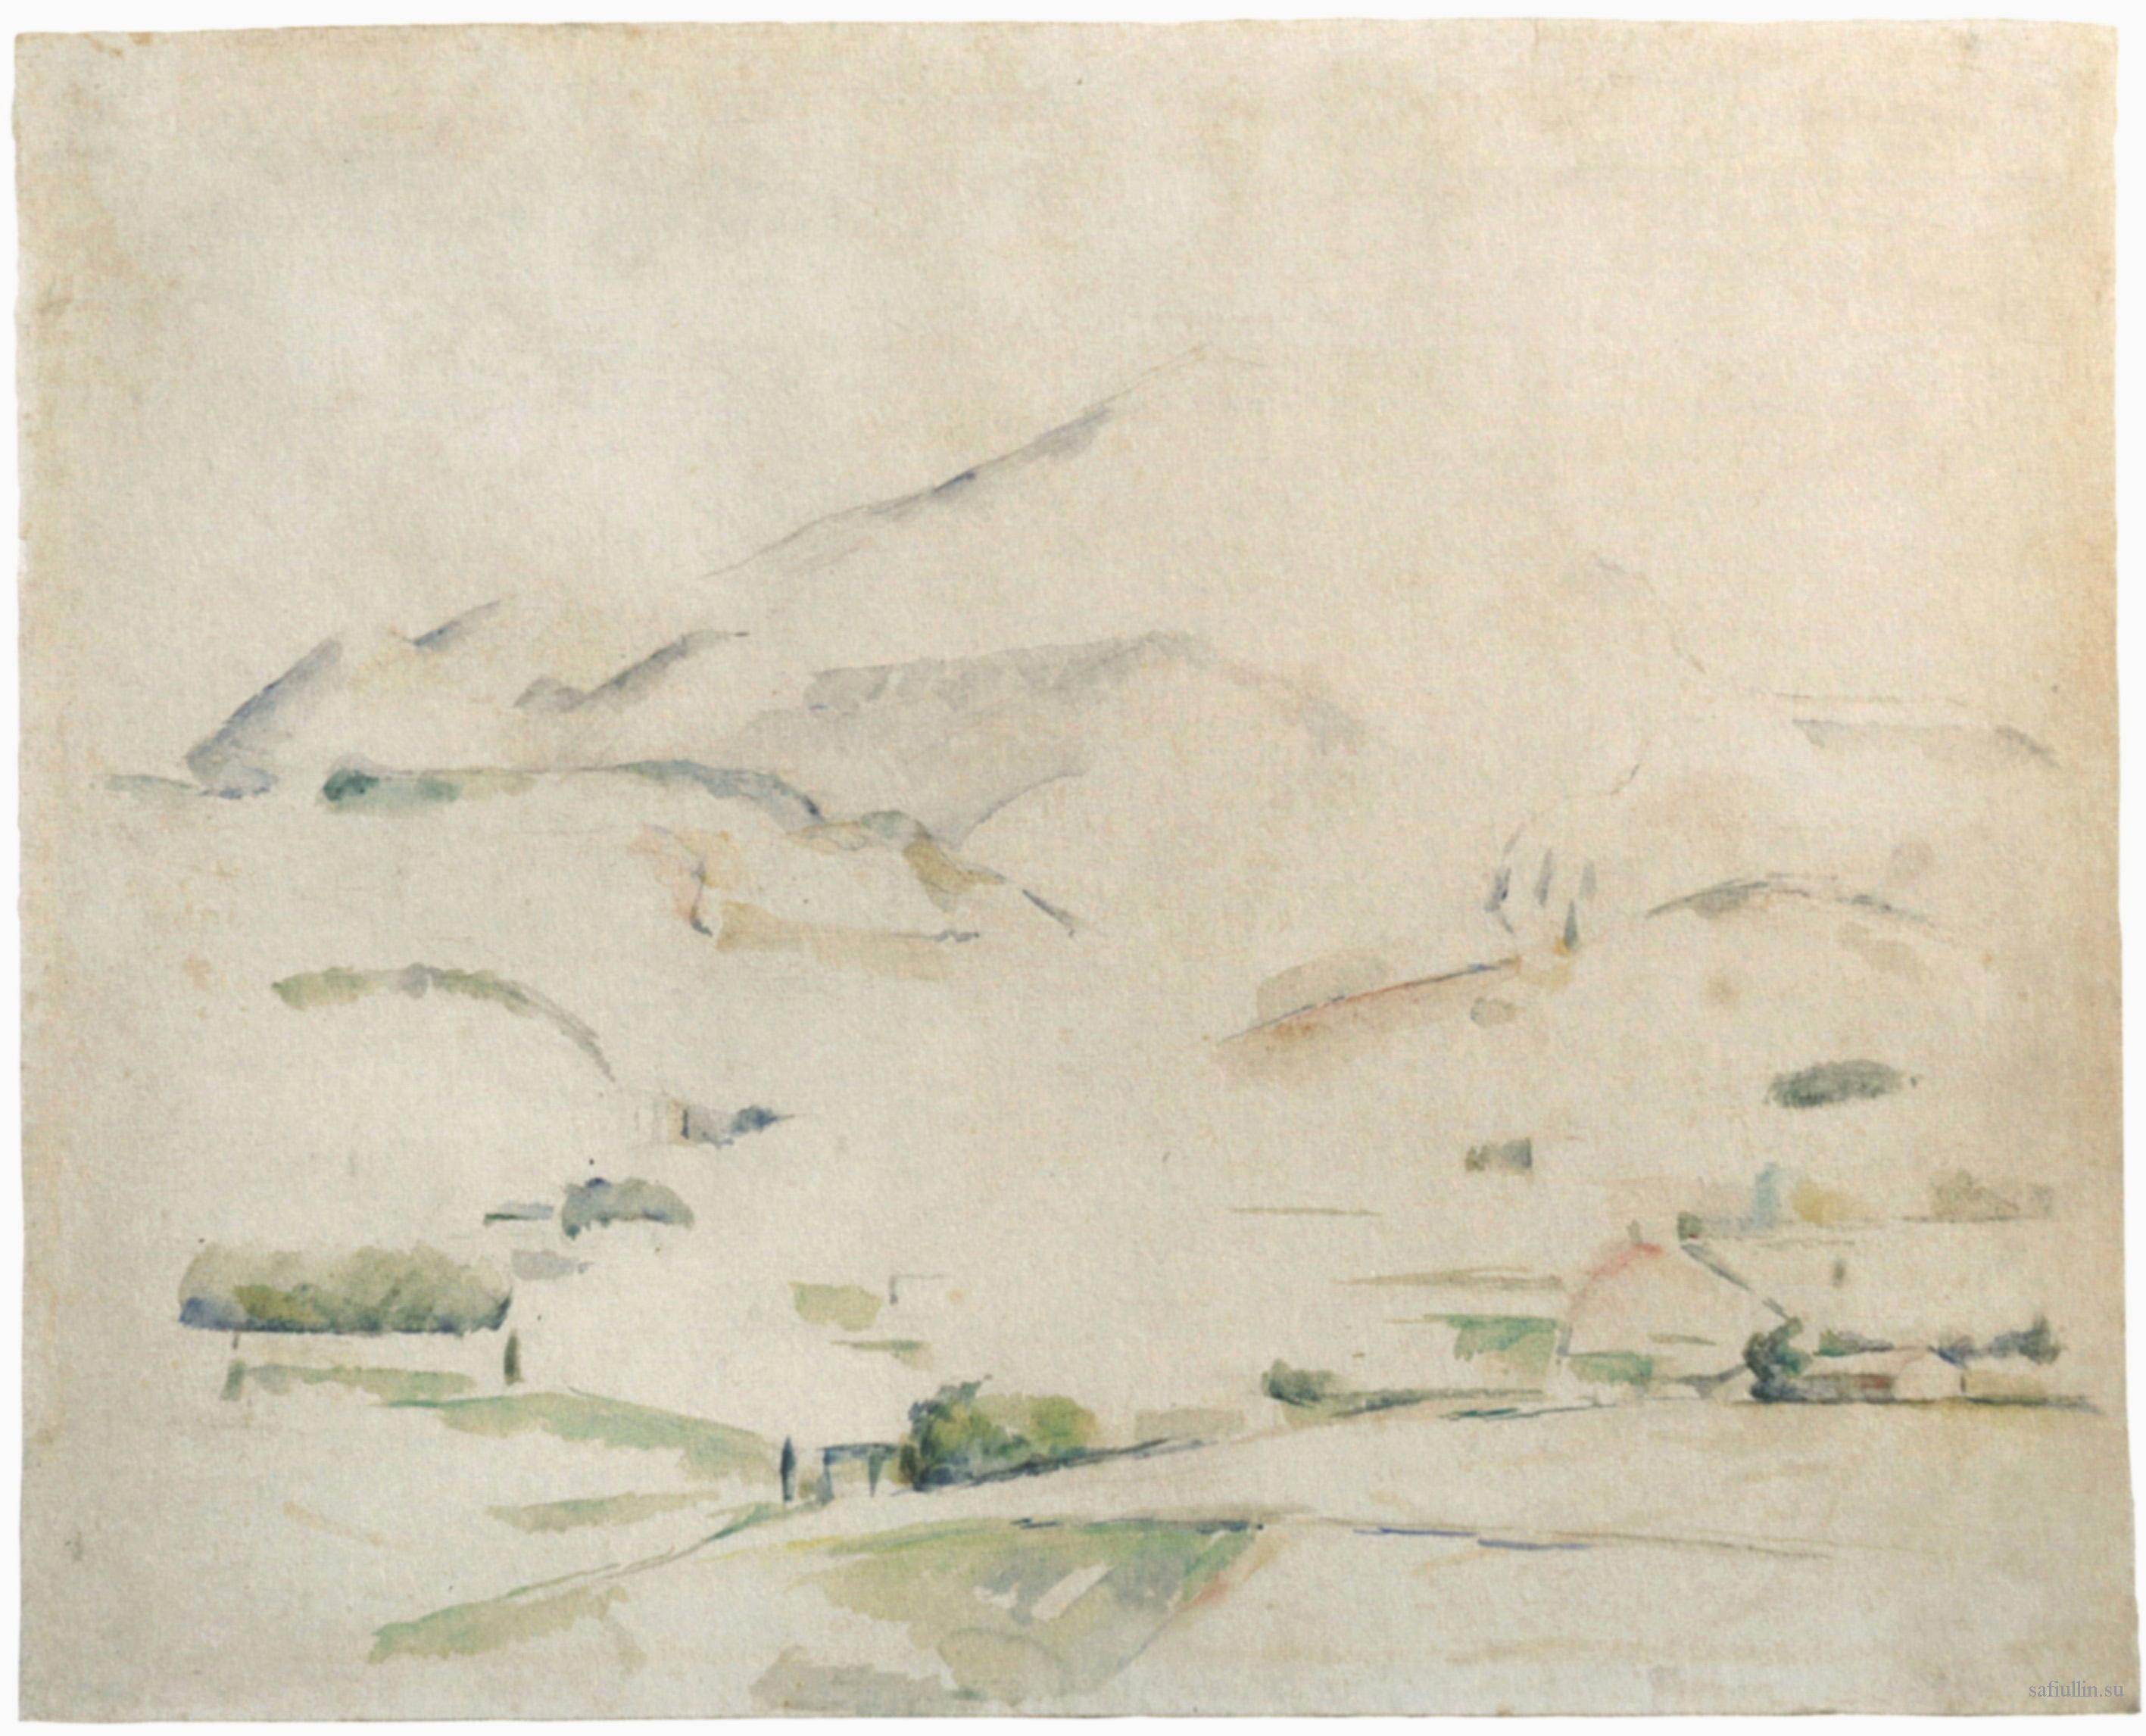 Сезанн рисунок La Montagne Sainte-Victoire пейзажи природы Сафиуллин акварель 1888